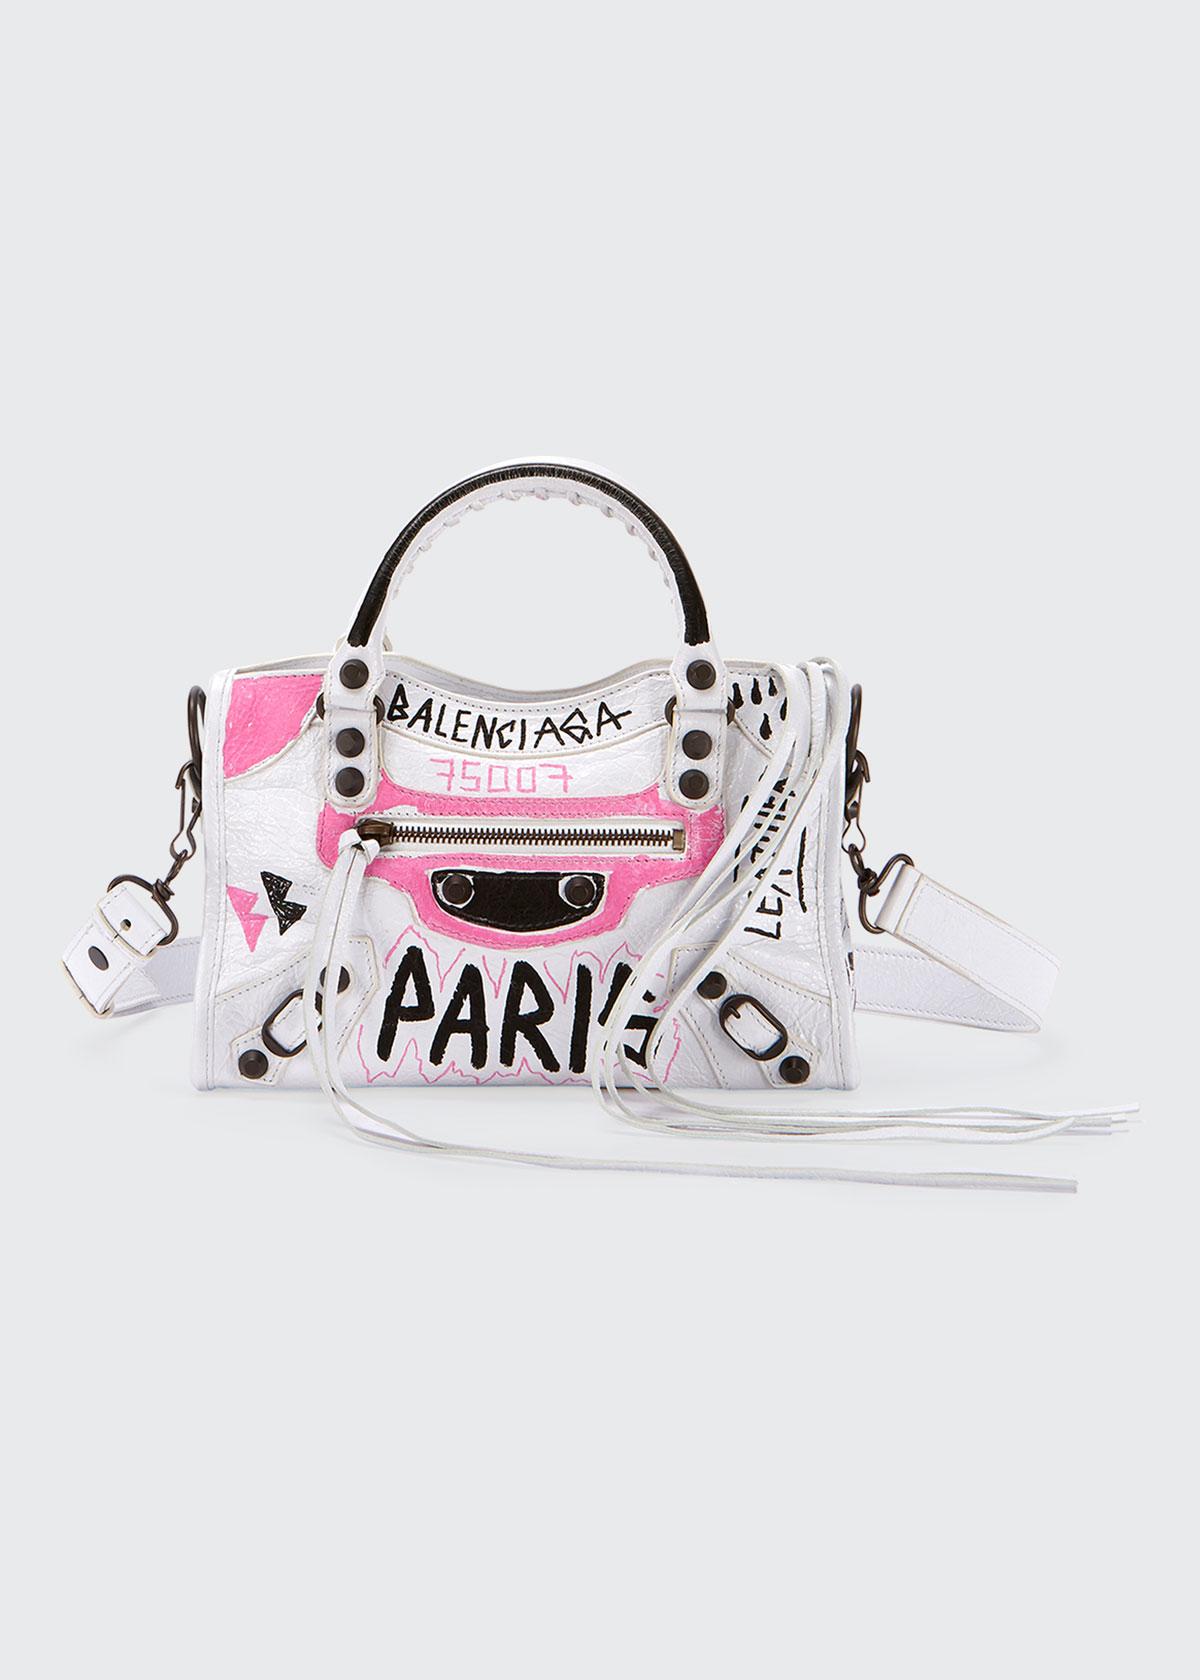 3b3d2e5aa7 Balenciaga Classic City Mini Graffiti Satchel Bag In White Pattern ...